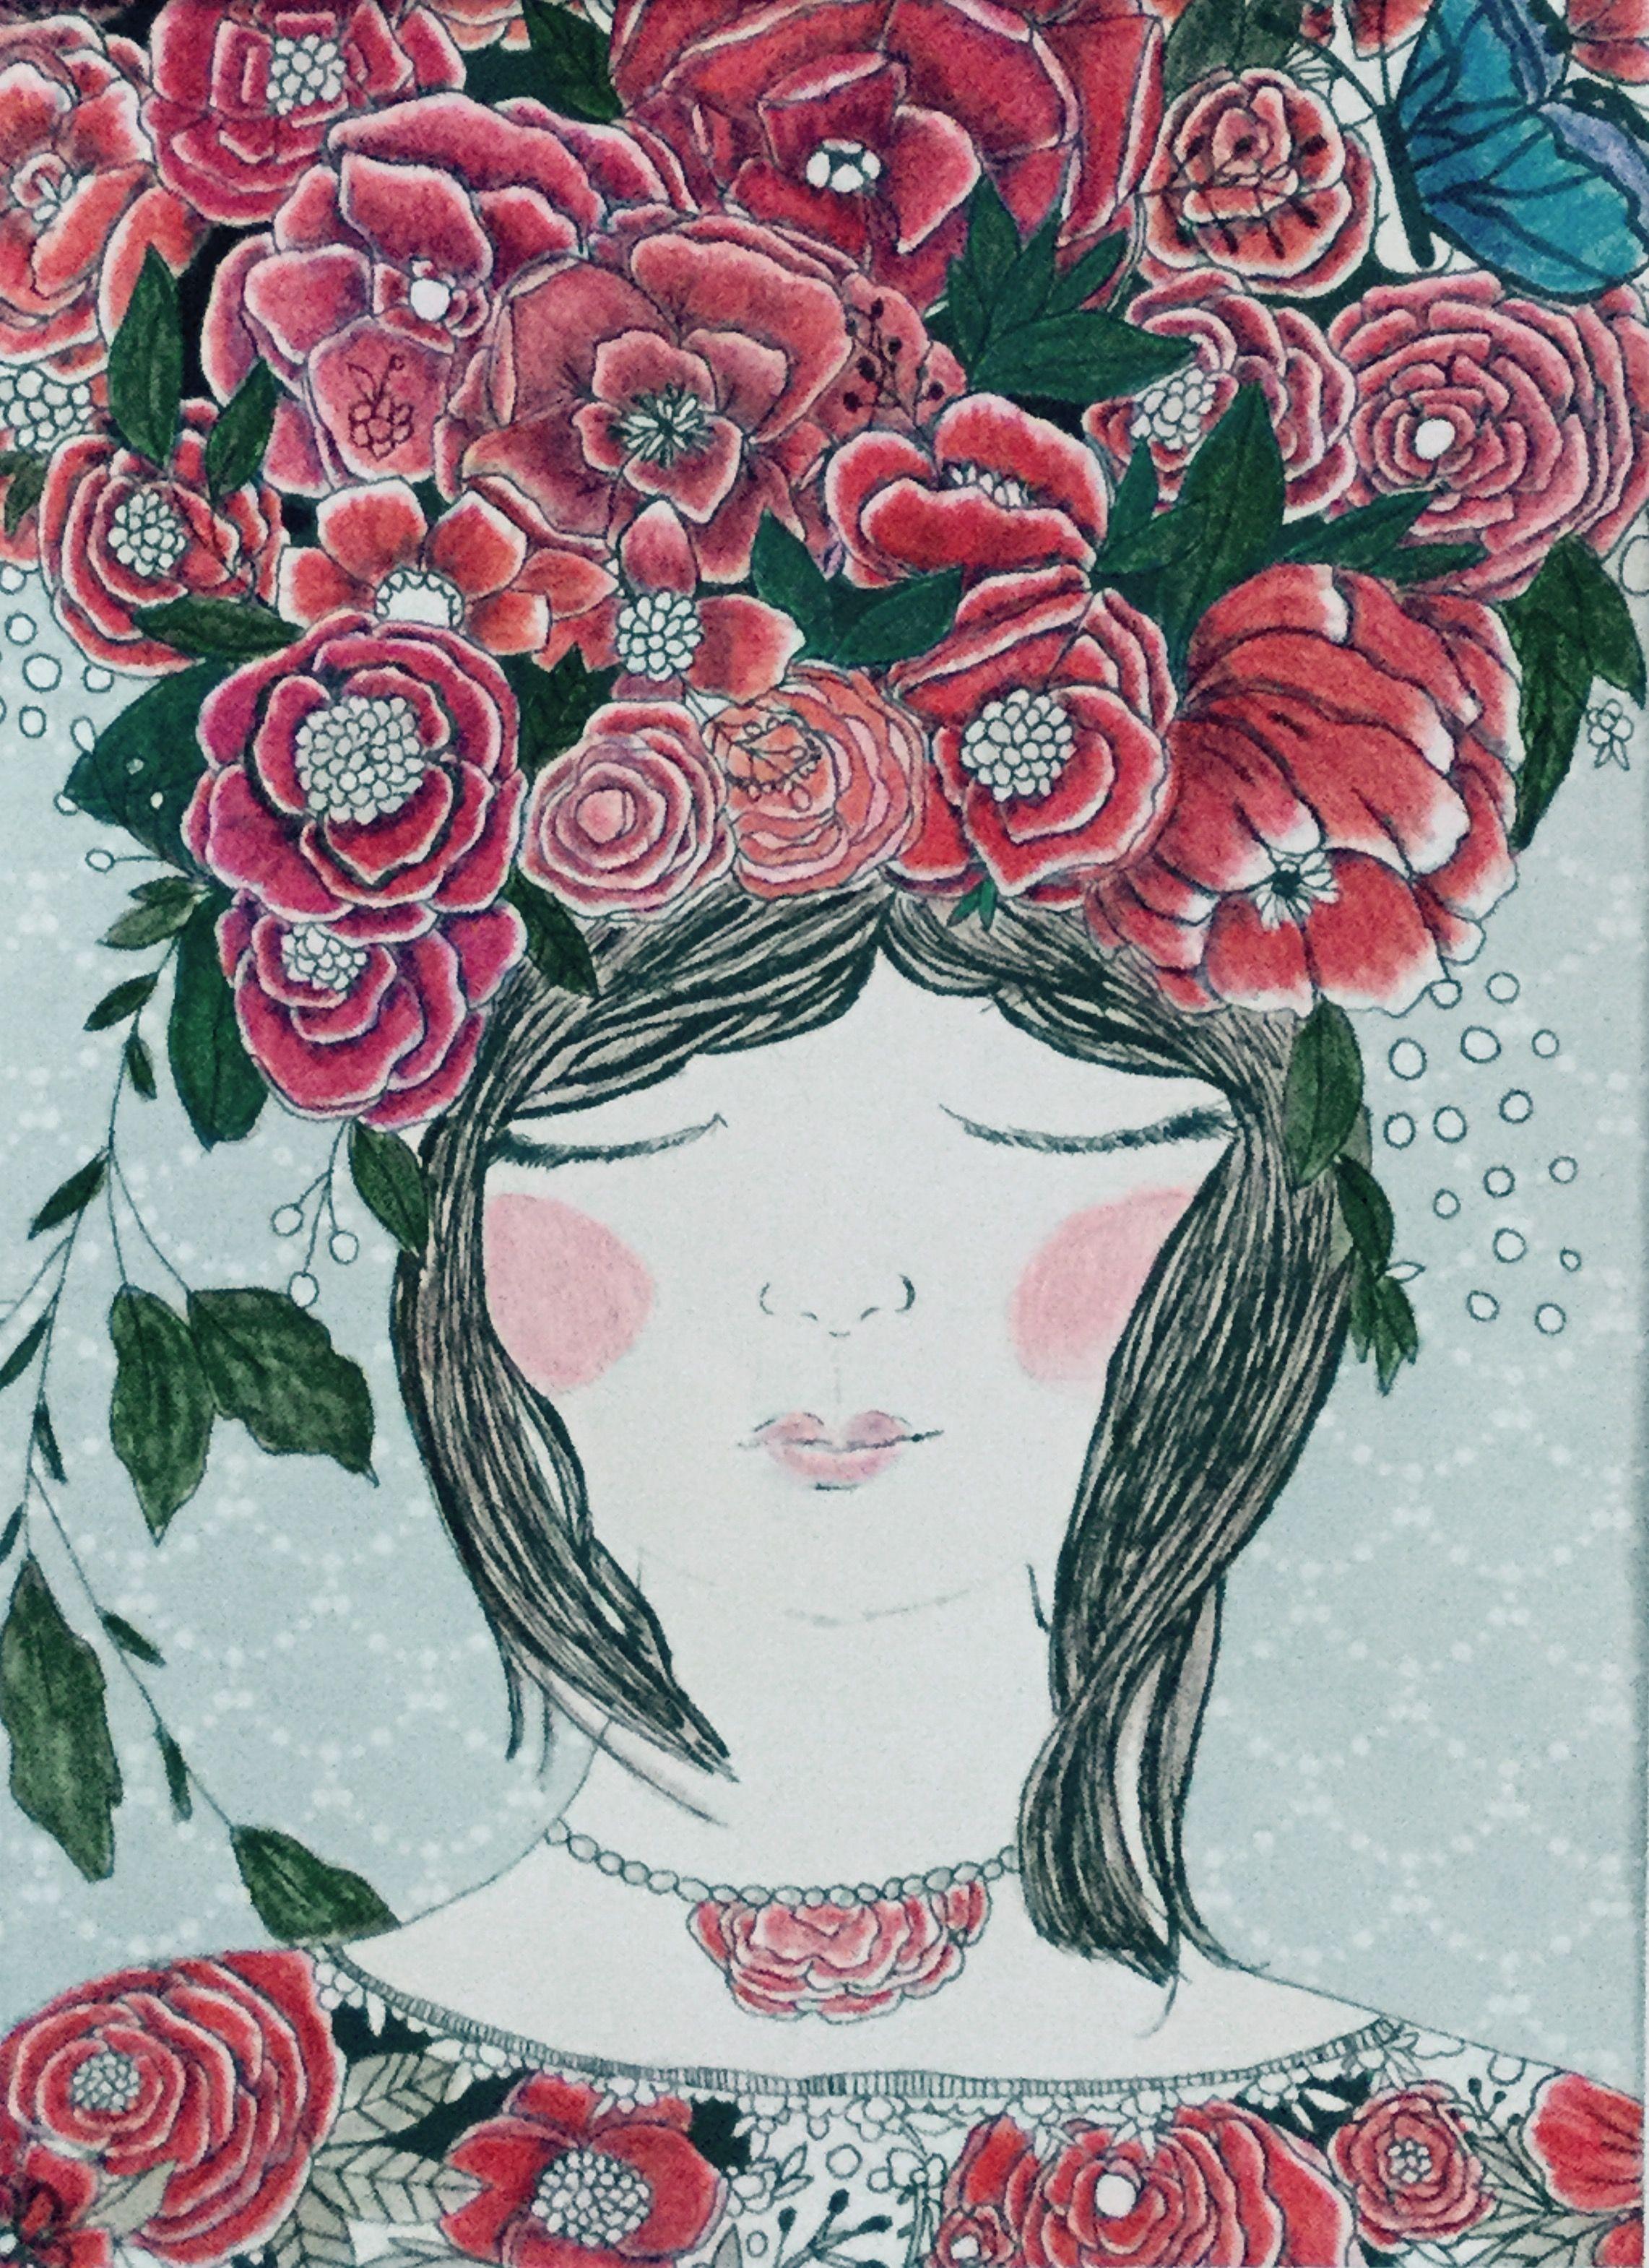 Bari J. // Coloring Book: Make Something Beautiful | Coloring Pages ...